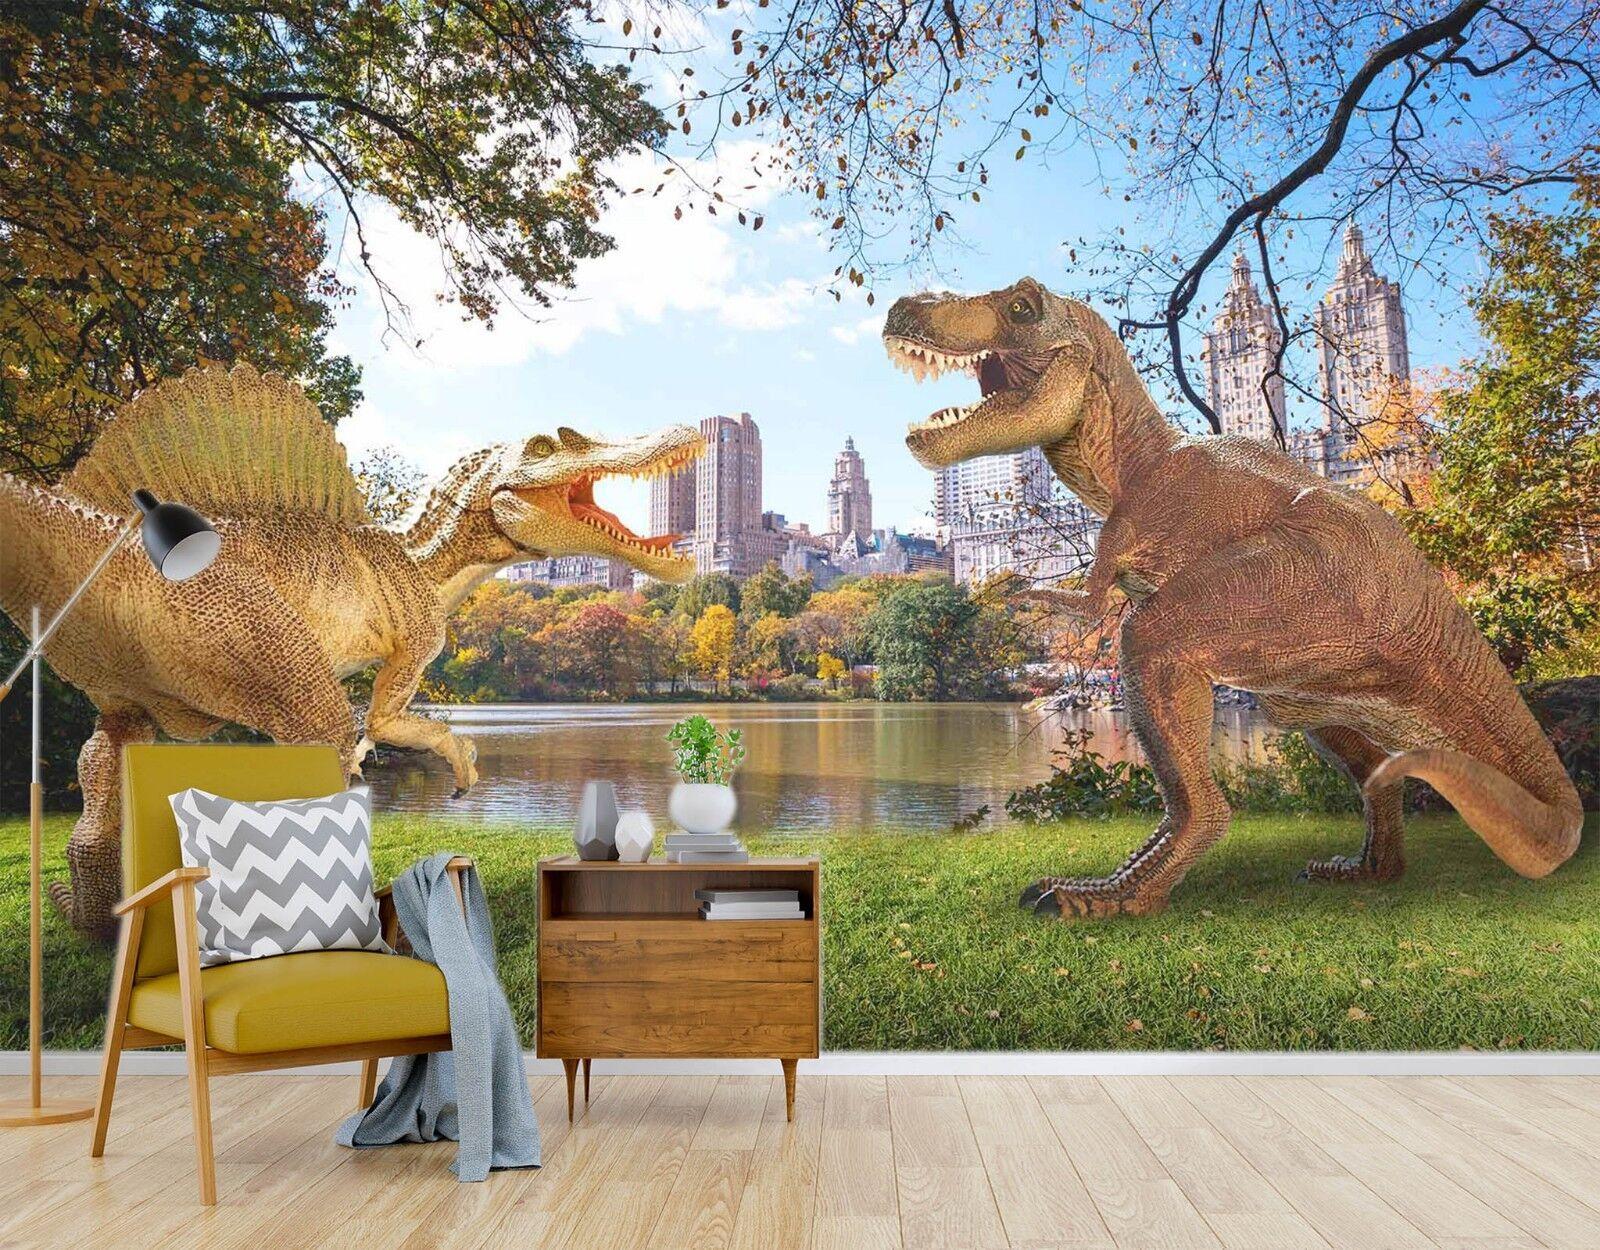 3D City Park Dinosaur  23 Wallpaper Mural Print Wall Indoor Wallpaper Murals UK